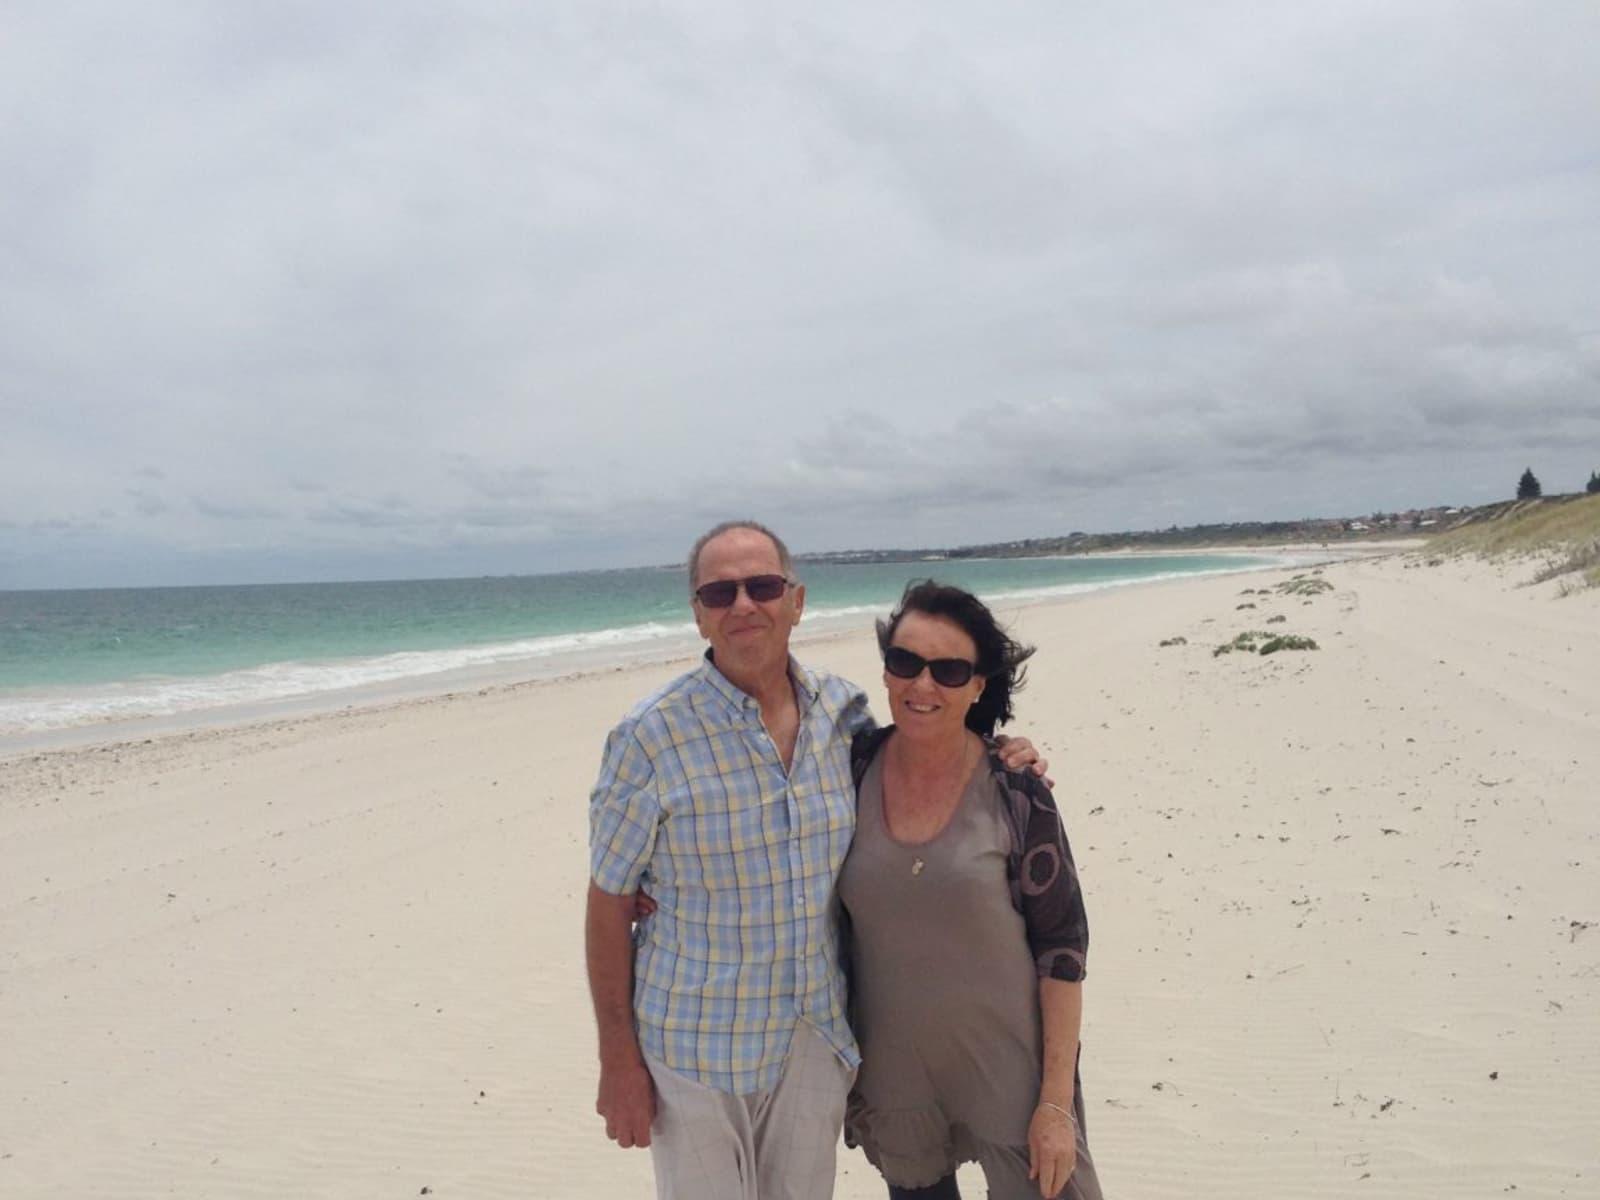 Elaine & Frederick from Perth, Western Australia, Australia